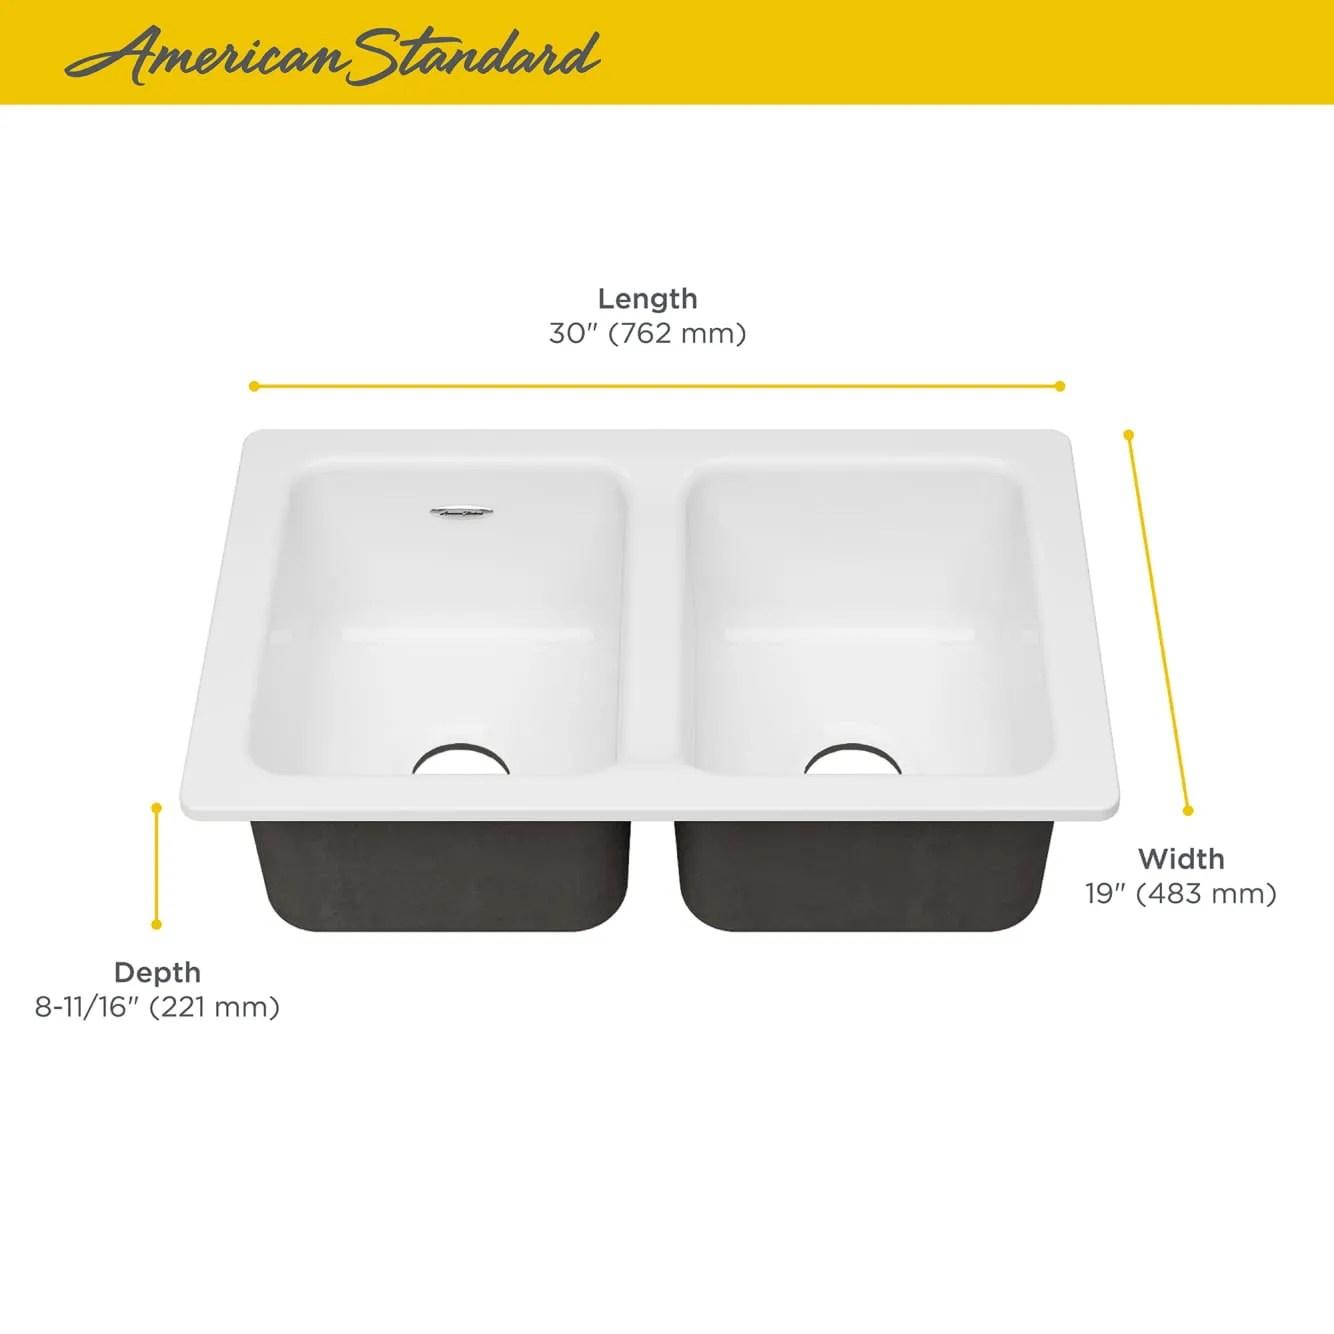 american standard 77db 30190